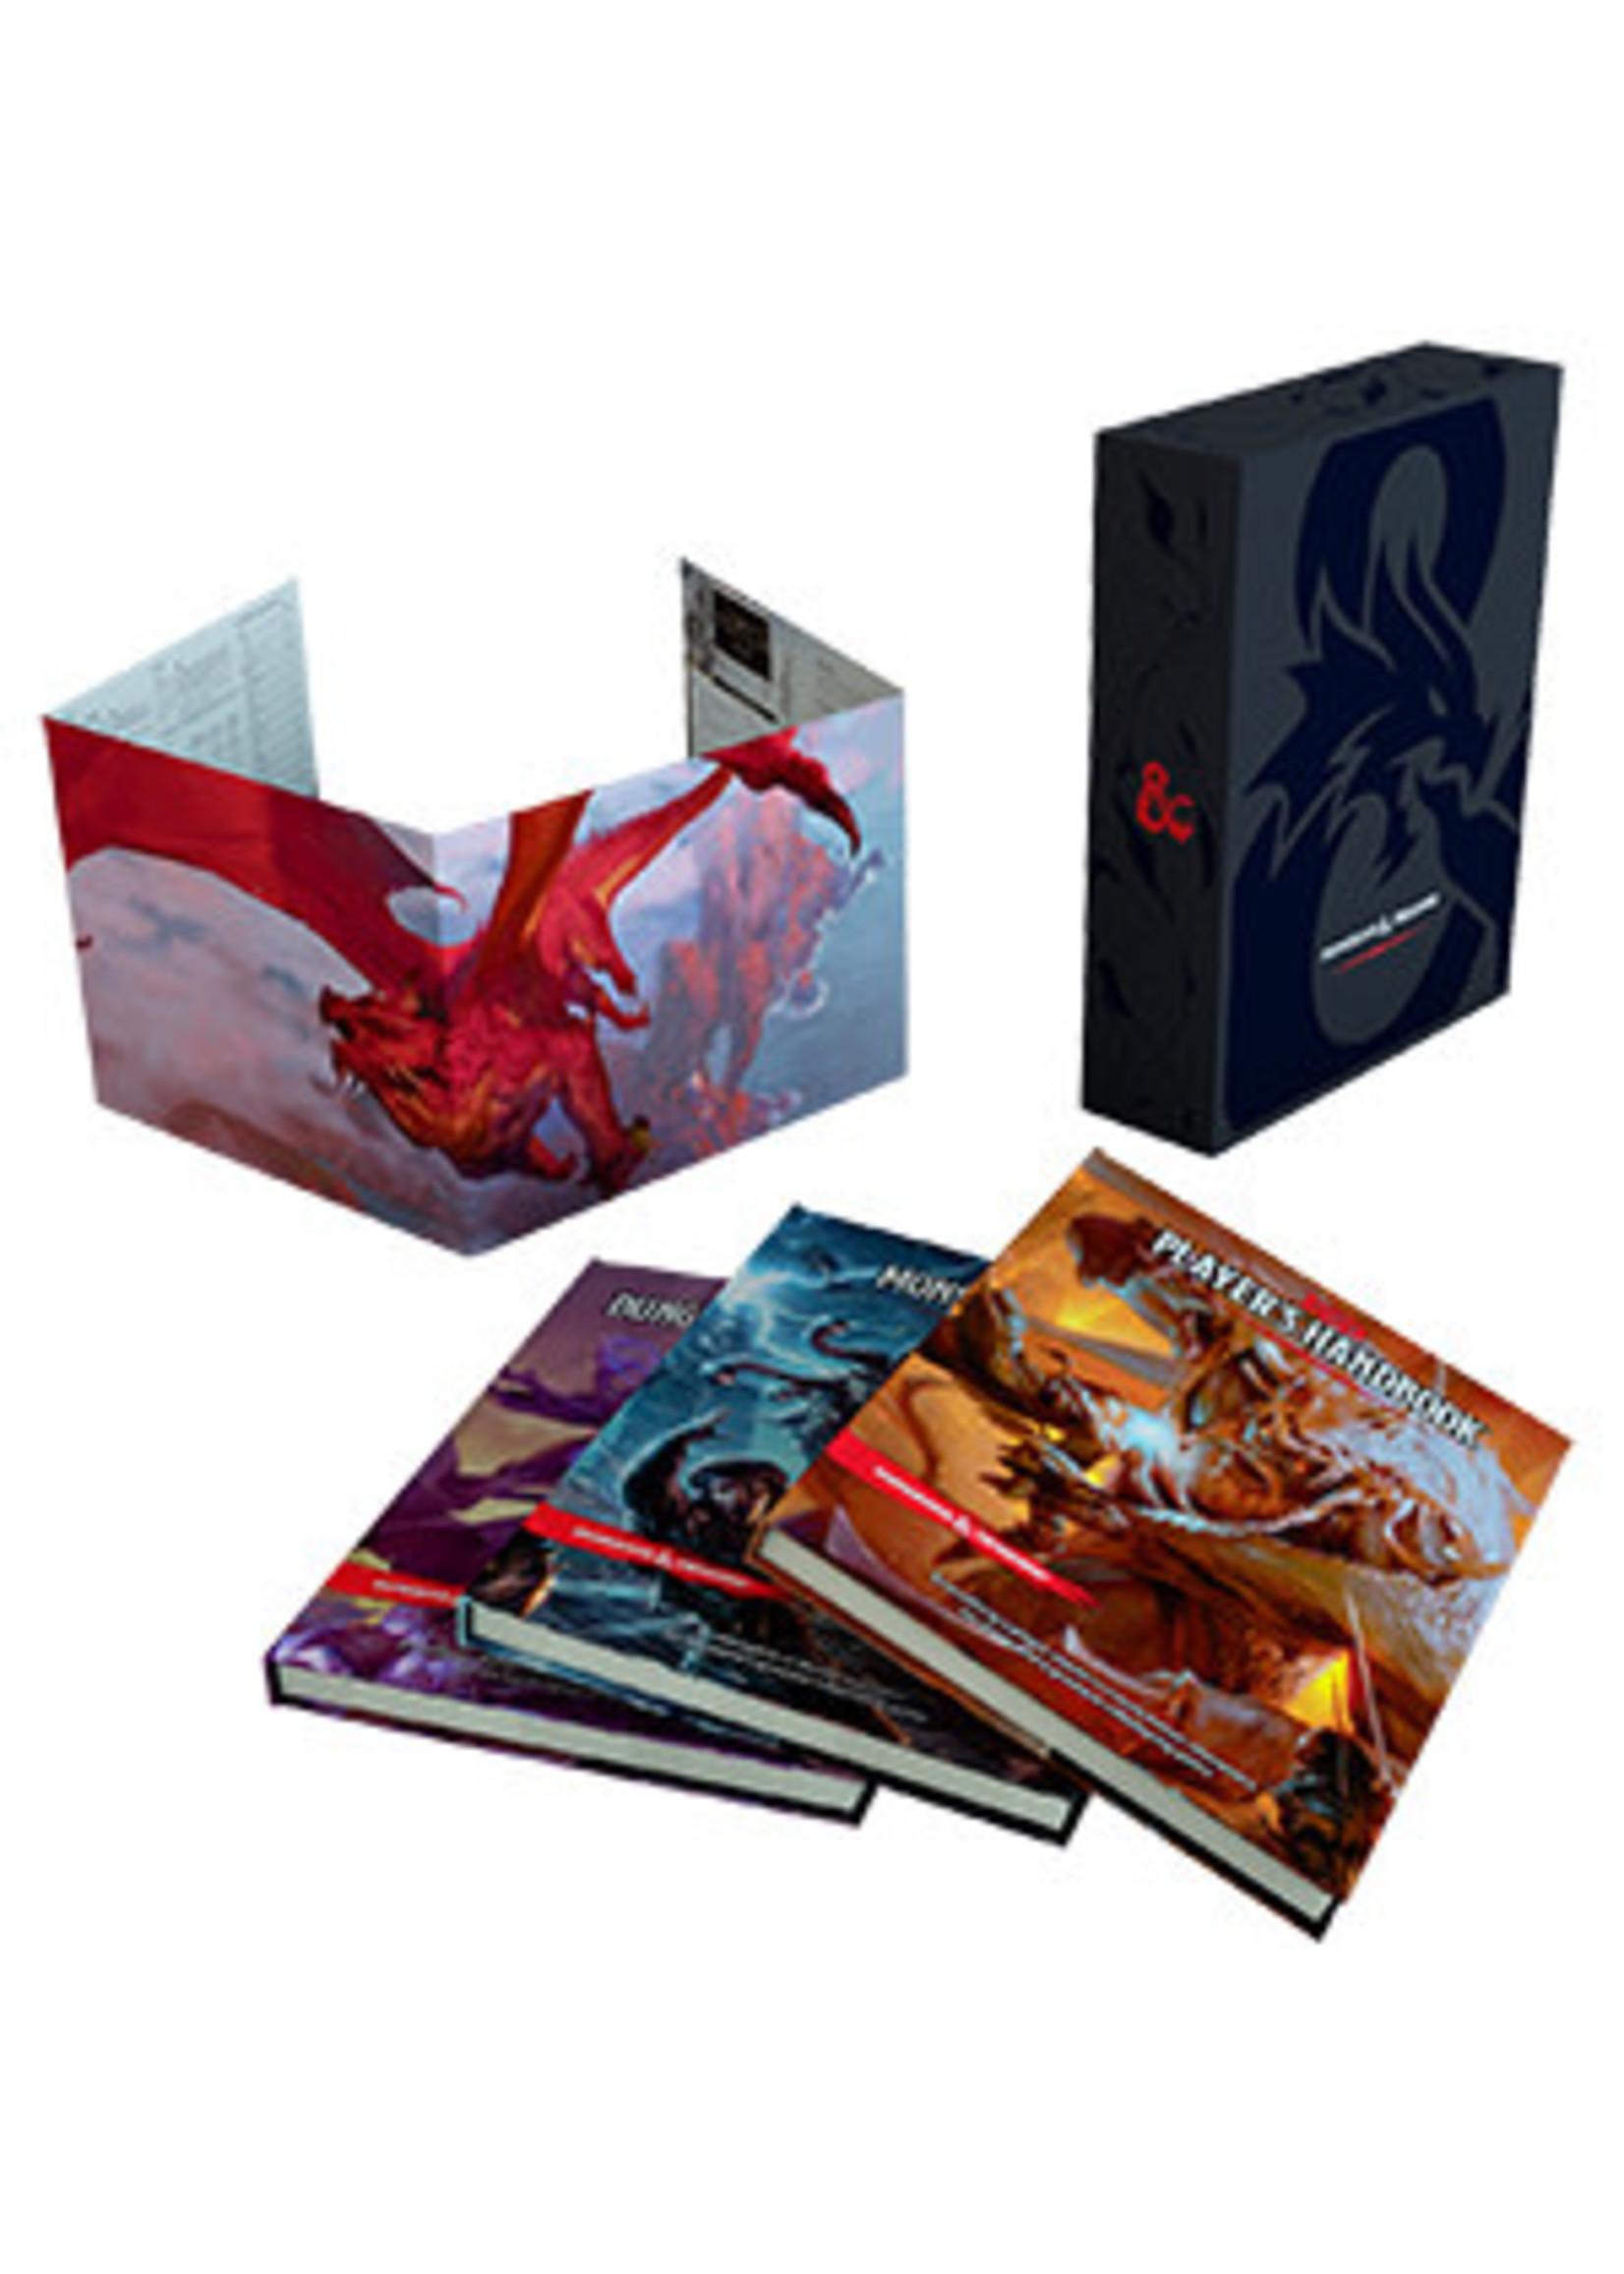 Dungeons & Dragons D&D 5E Core Rulebook Gift Set